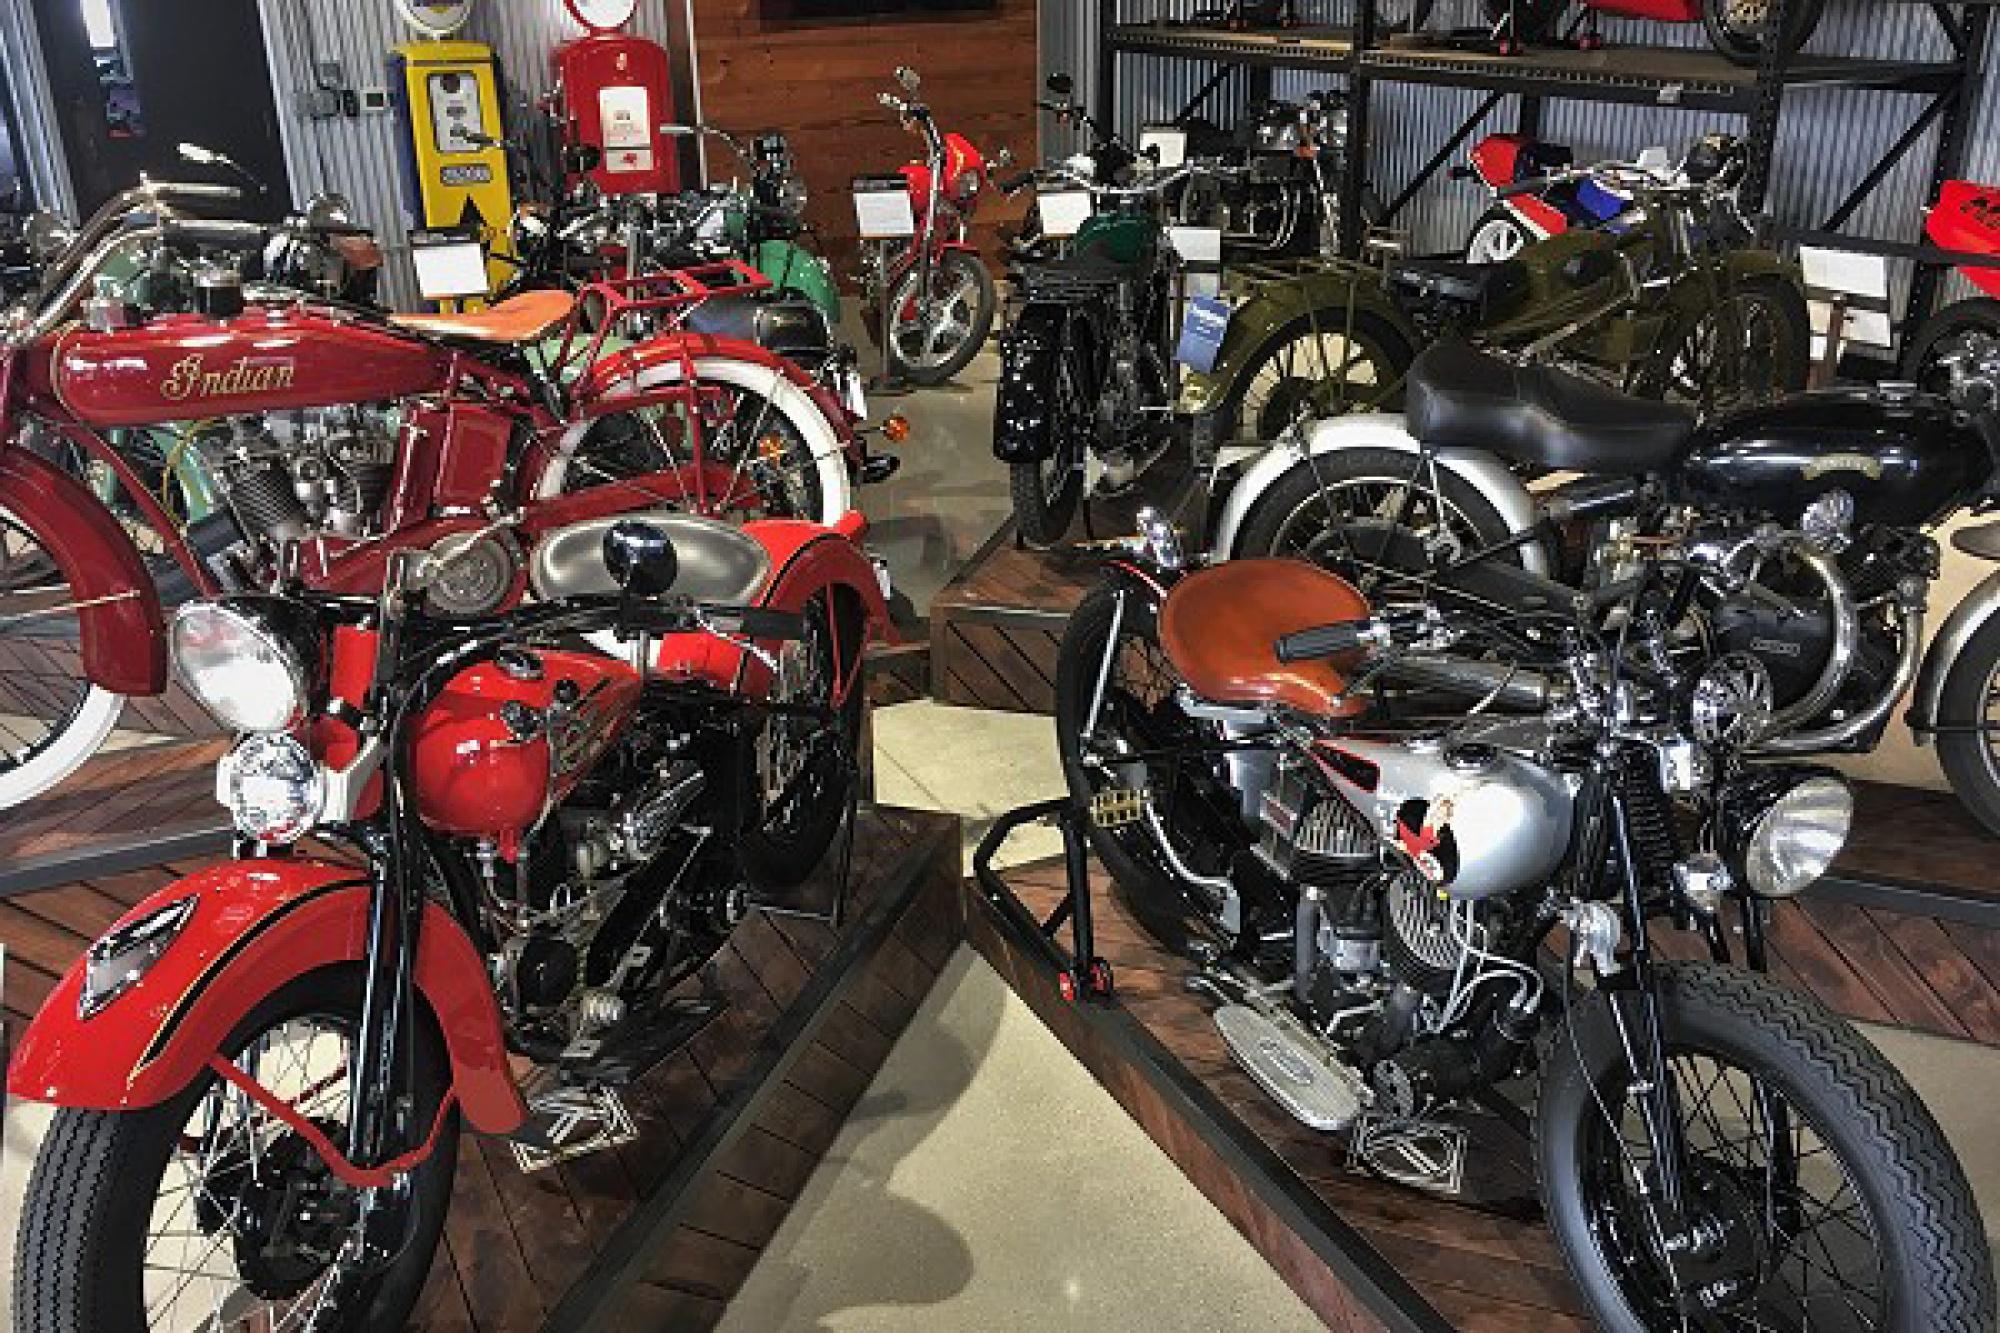 Motorcycles on the showroom floor